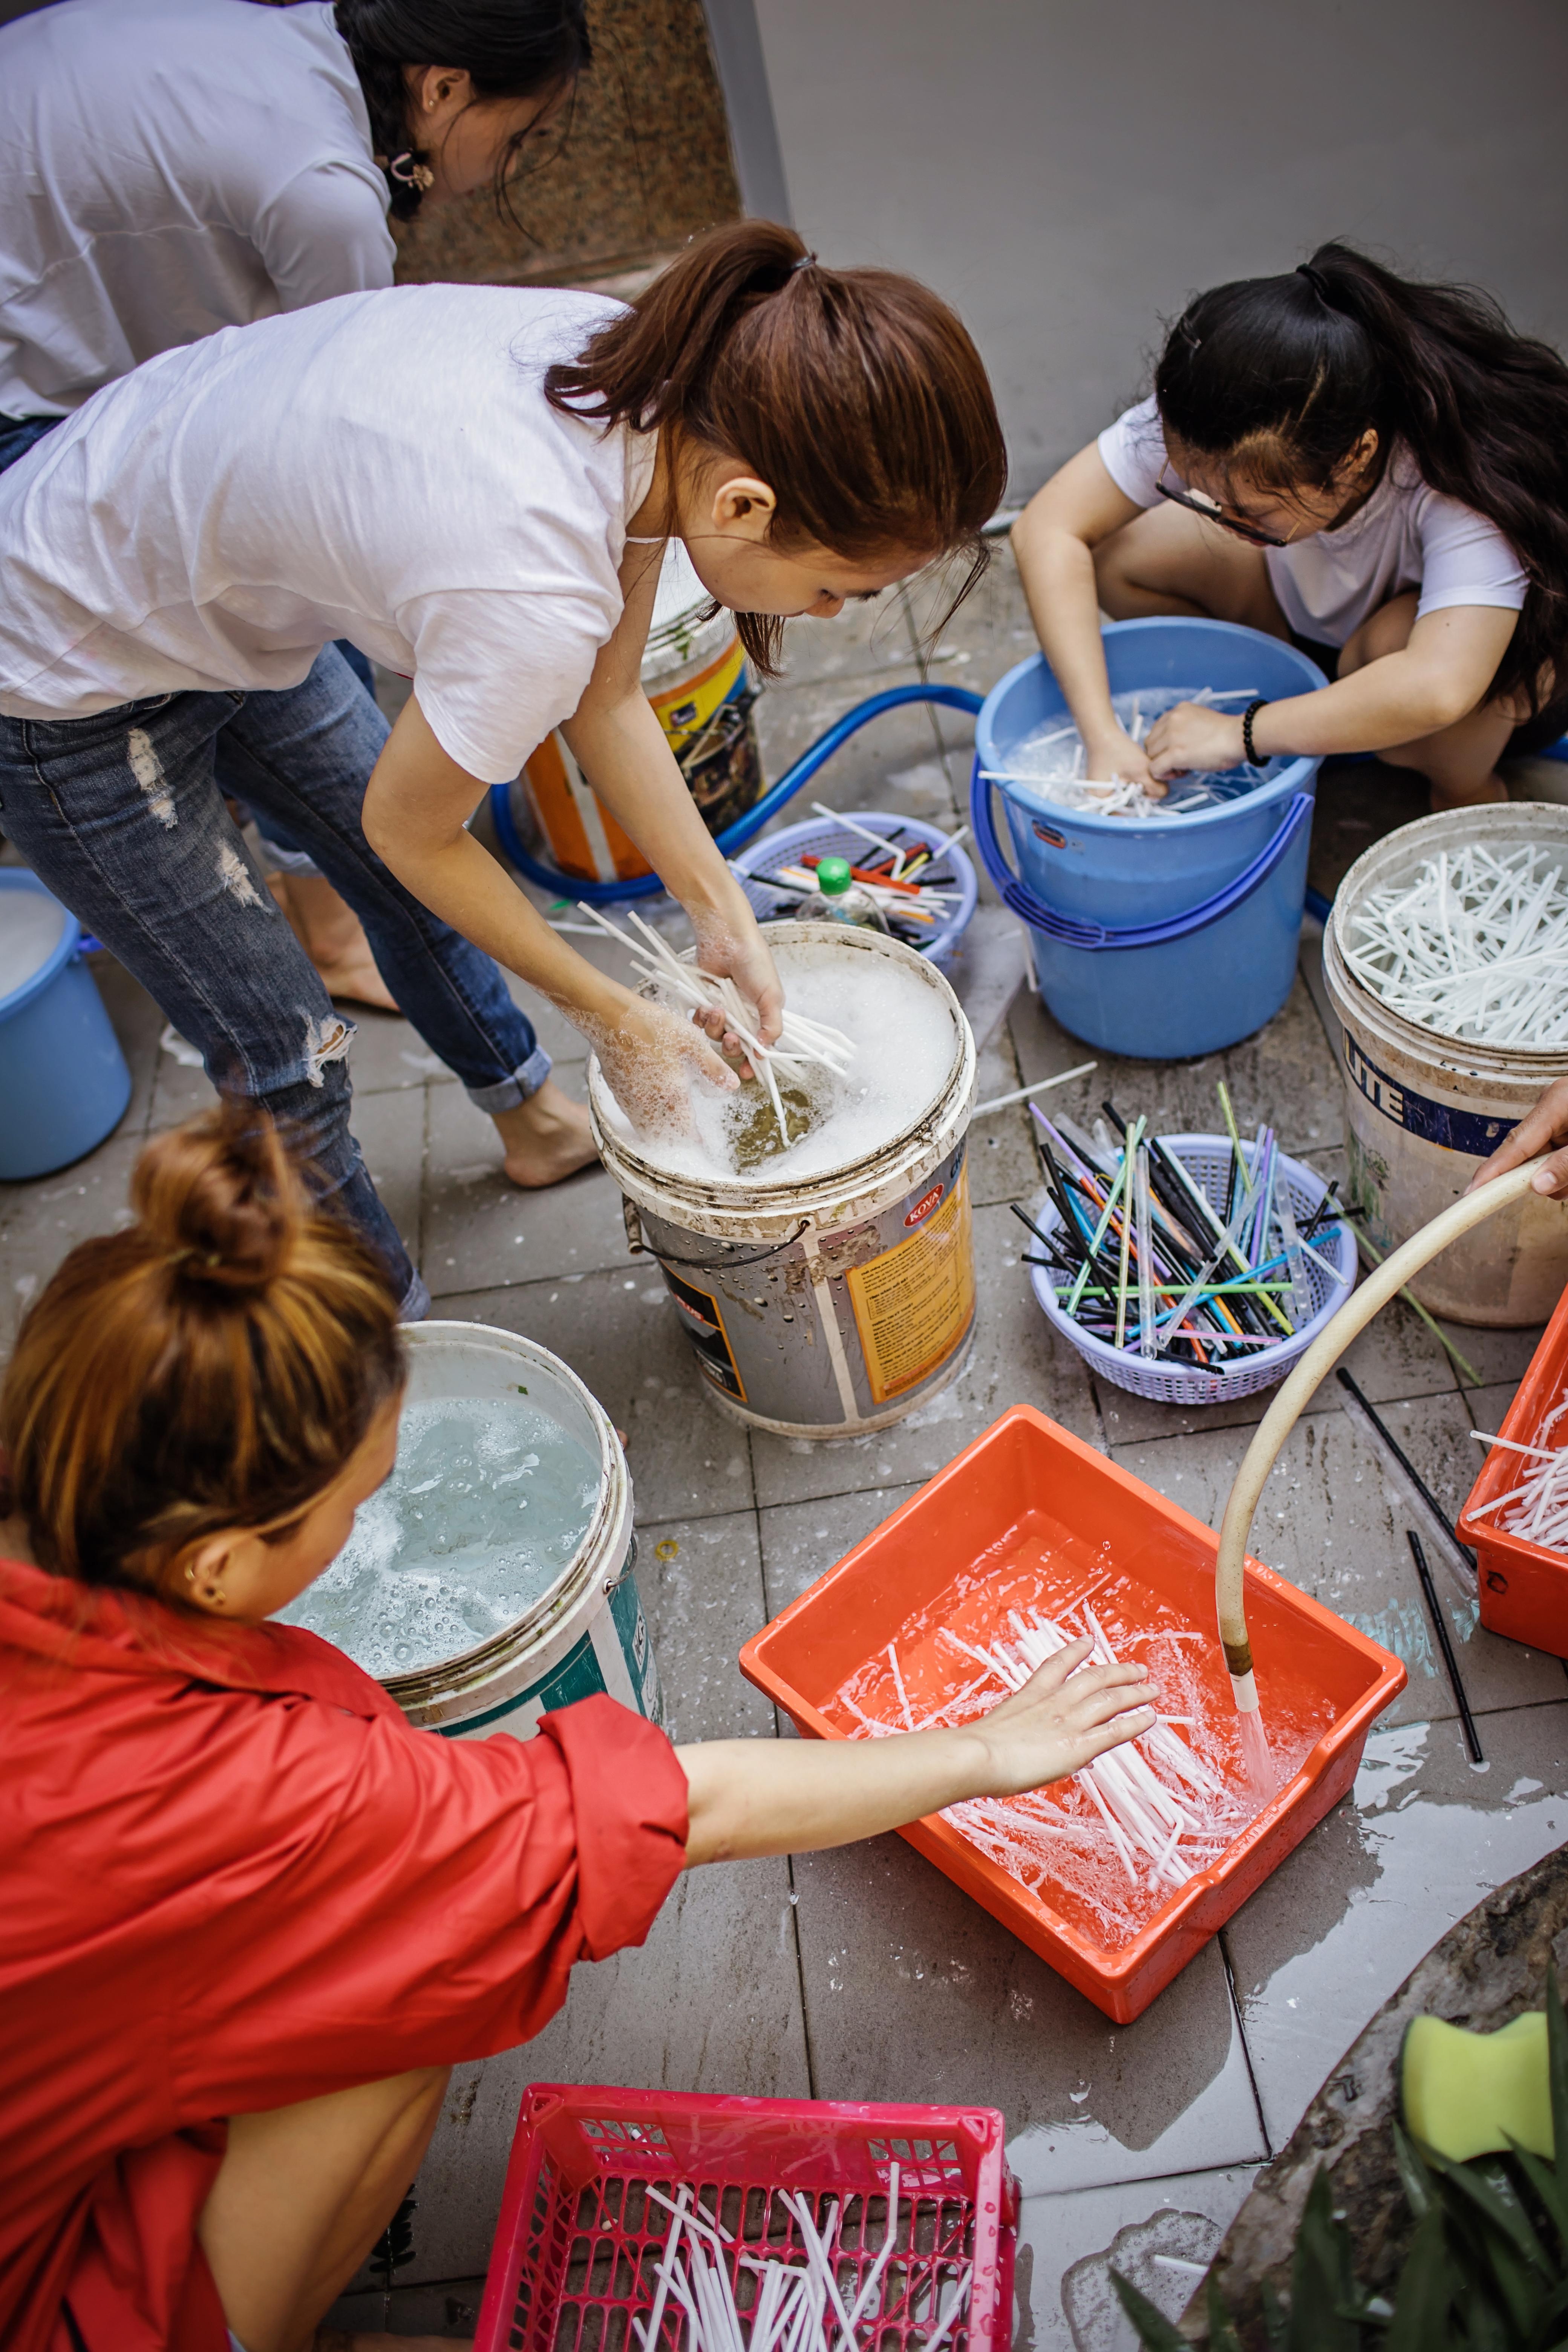 washing-plastic-straws-2-von-wong-zero-waste-saigon-strawpocalypse